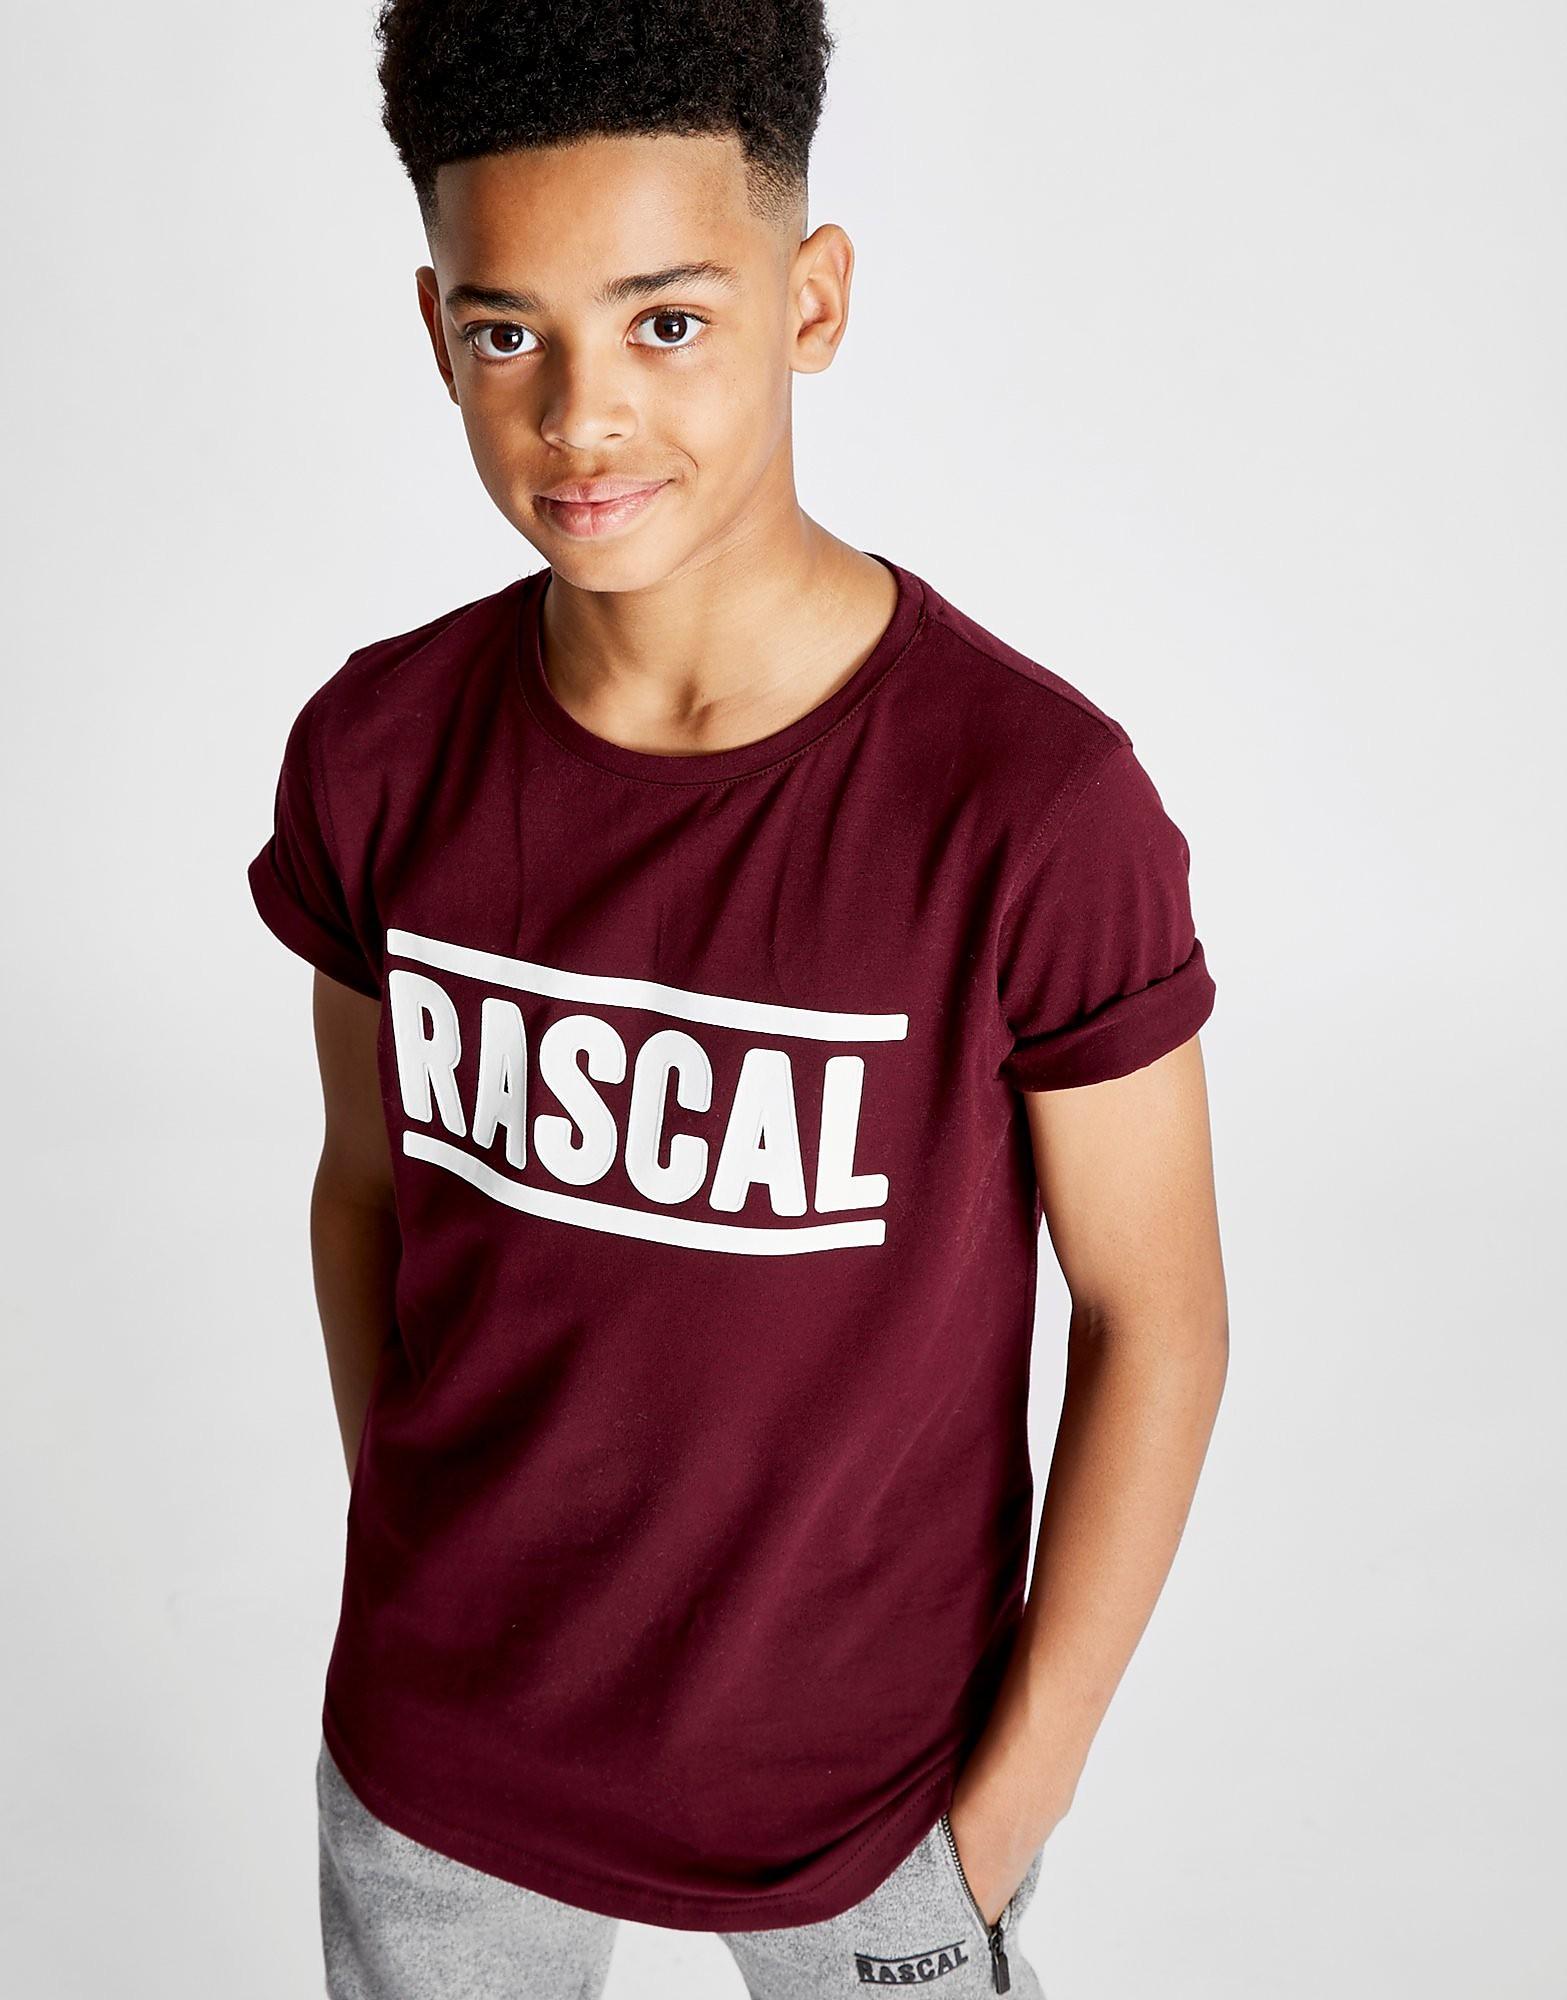 Rascal Lyon T-Shirt Junior